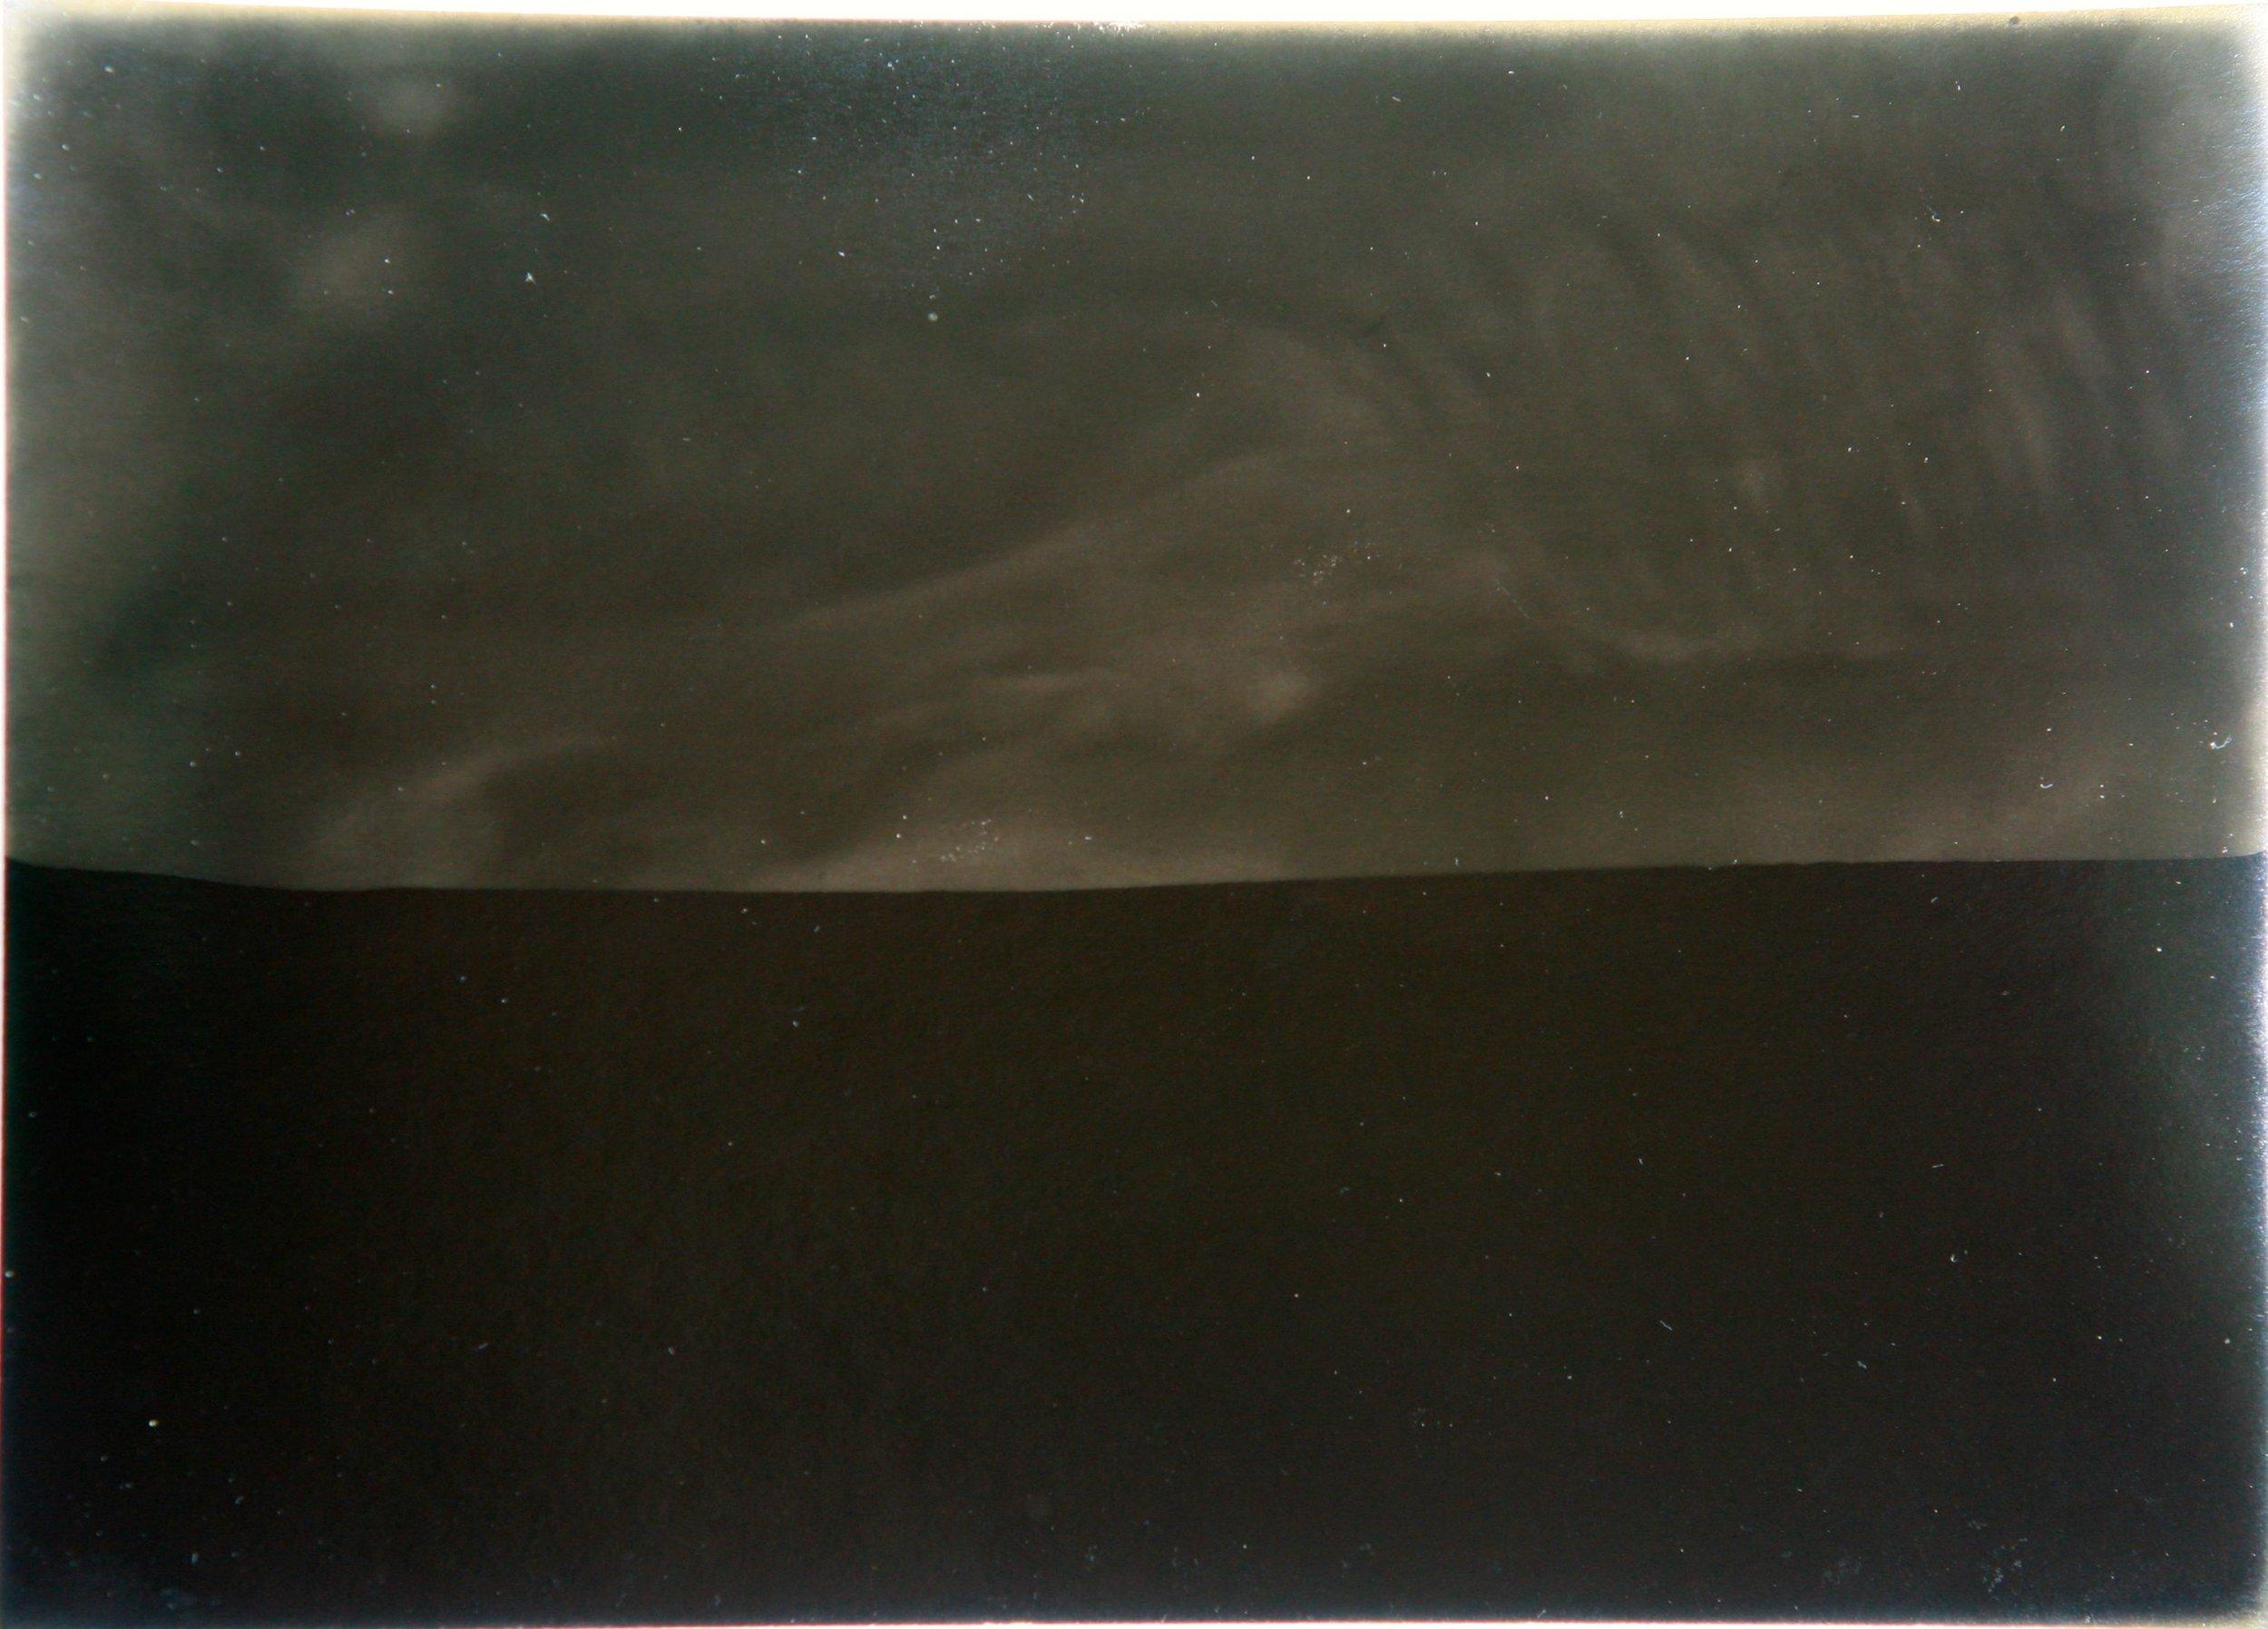 Kodak Velox F2, Expired November 1946, Processed 2011